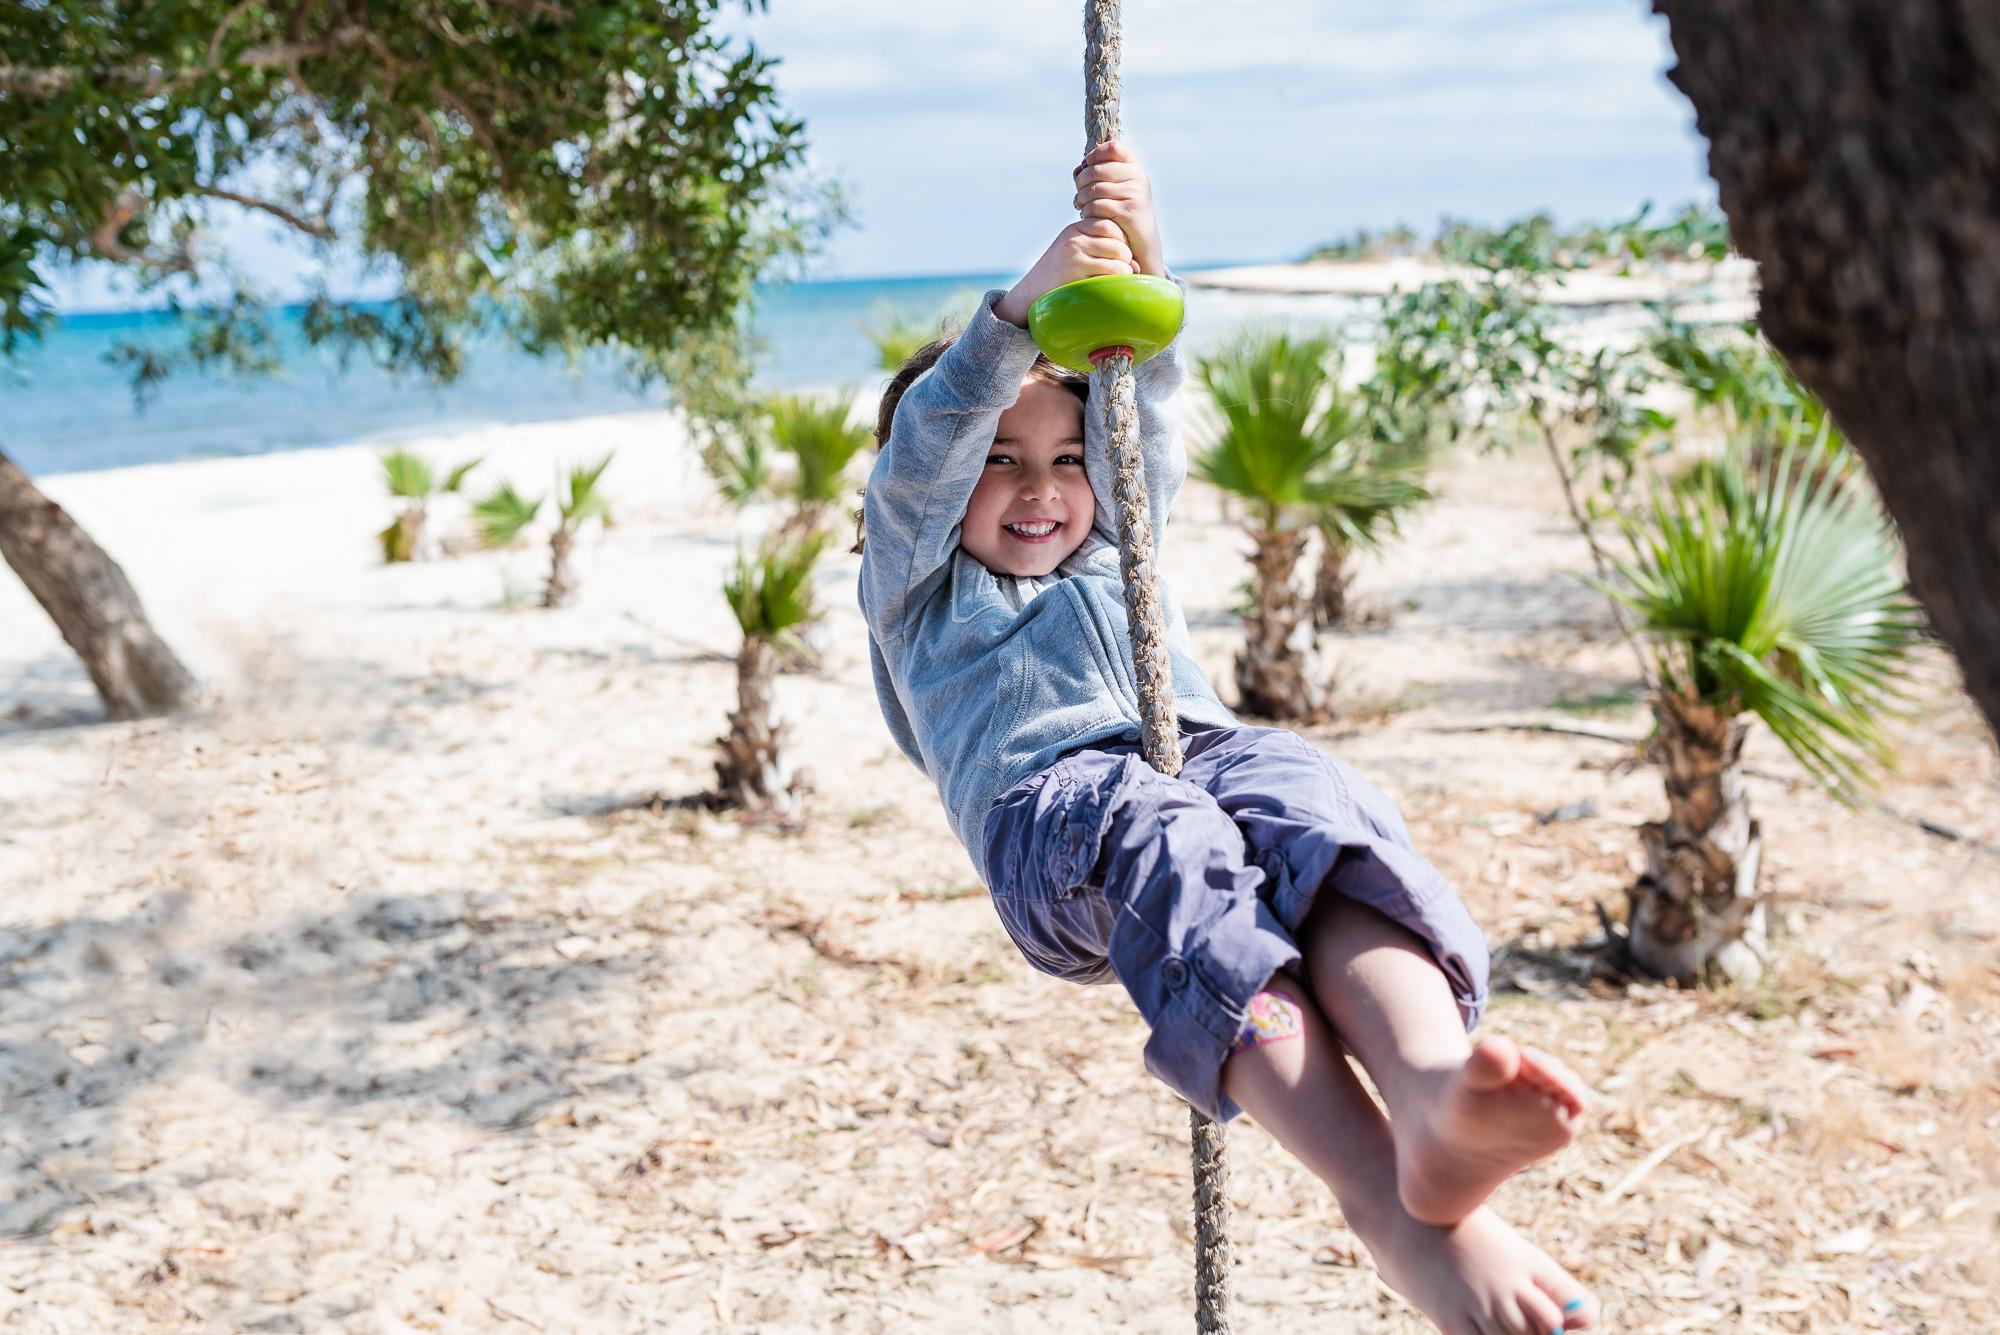 swinging in the air on the beach.jpg